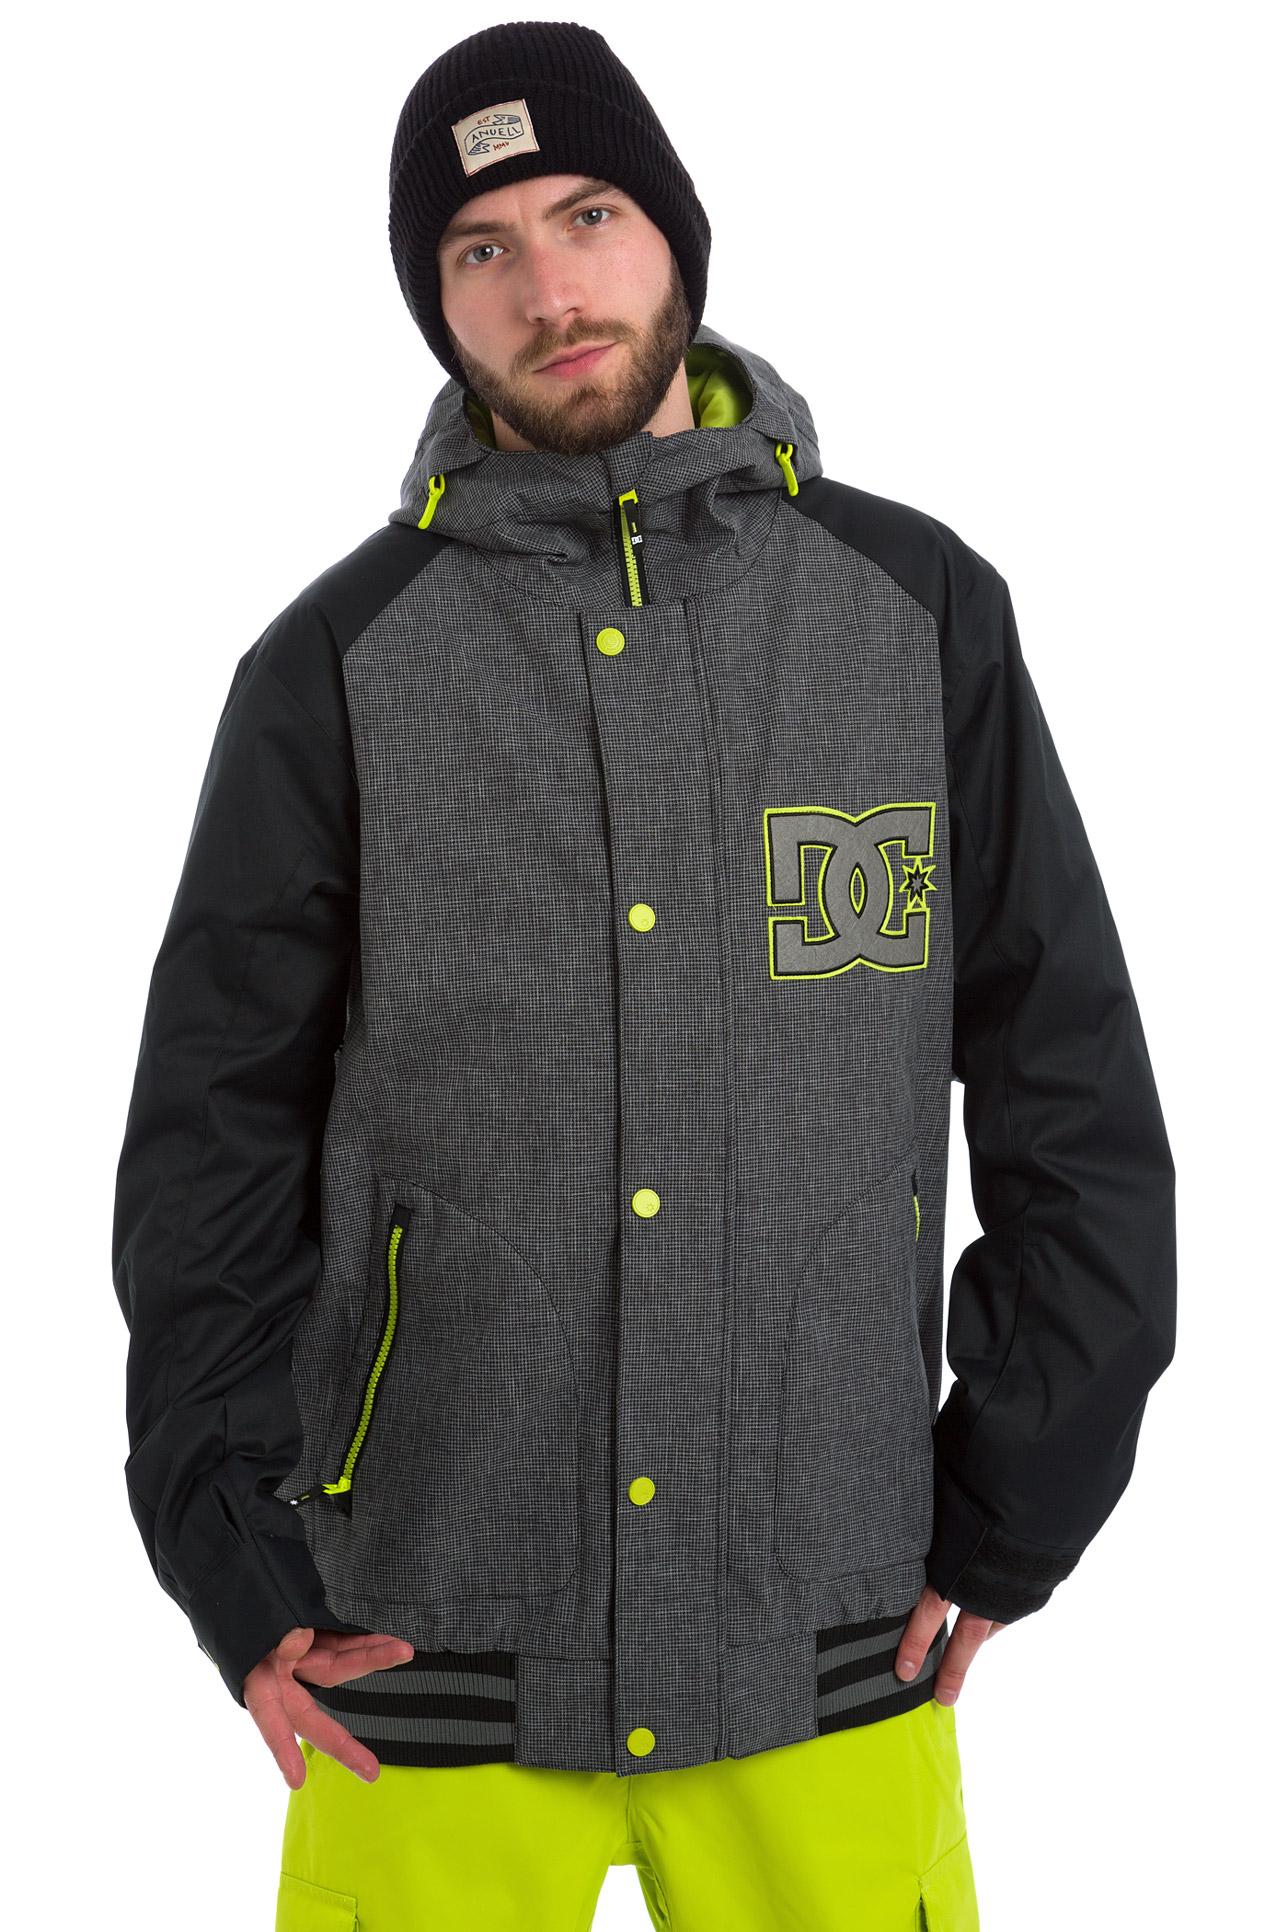 Jacket Dcla Dc black Green Buy At Skatedeluxe Snowboard PZPEwqdF